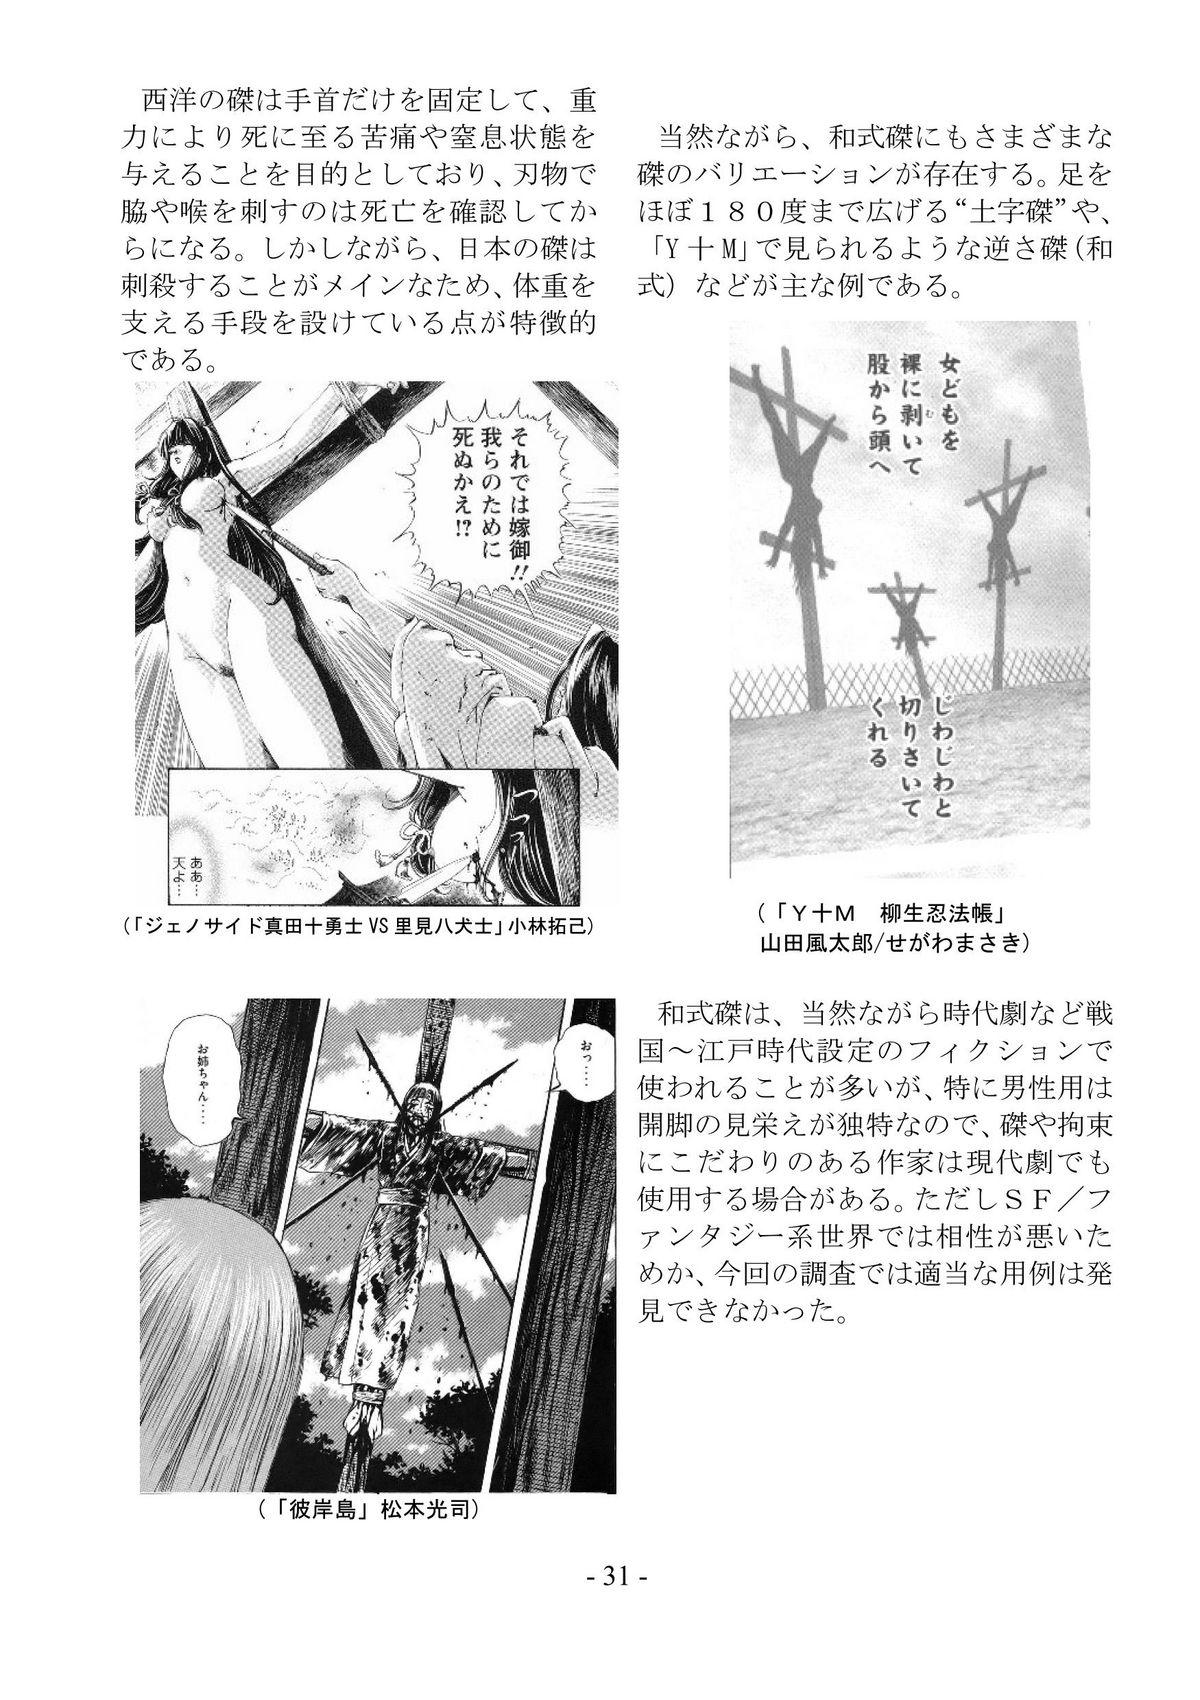 encyclopedia of crucifixion 31